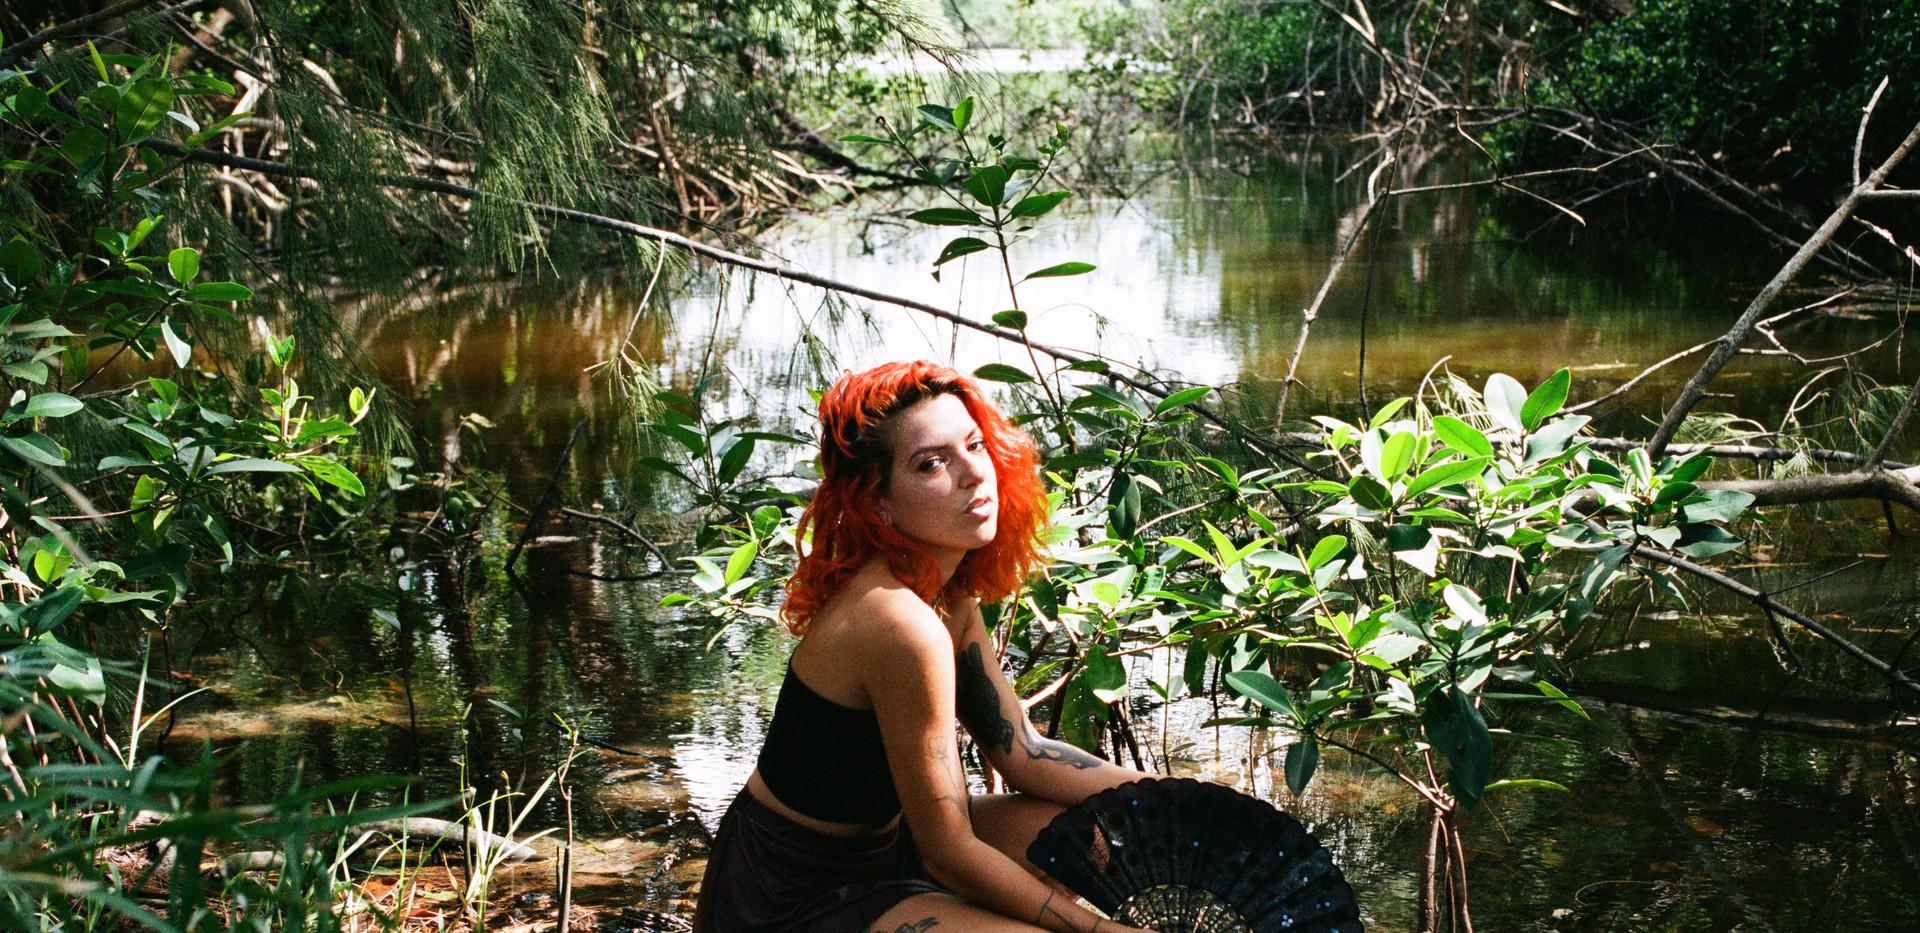 Miami Artist Muzii